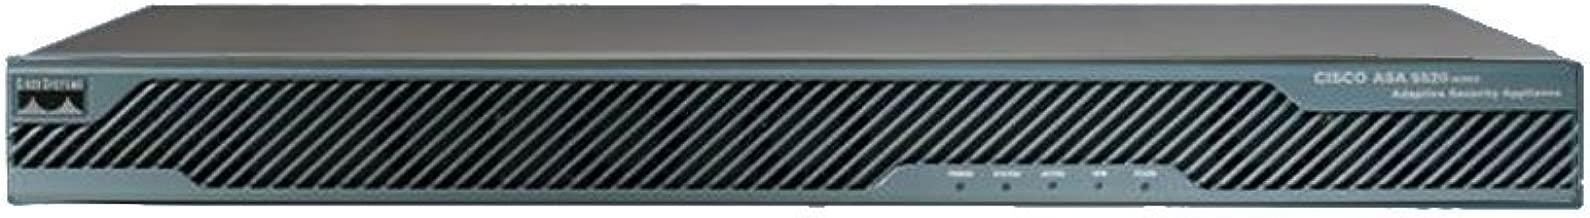 Cisco ASA5520 ASA5520-BUN-K9 Security Plus Firewall Appliance